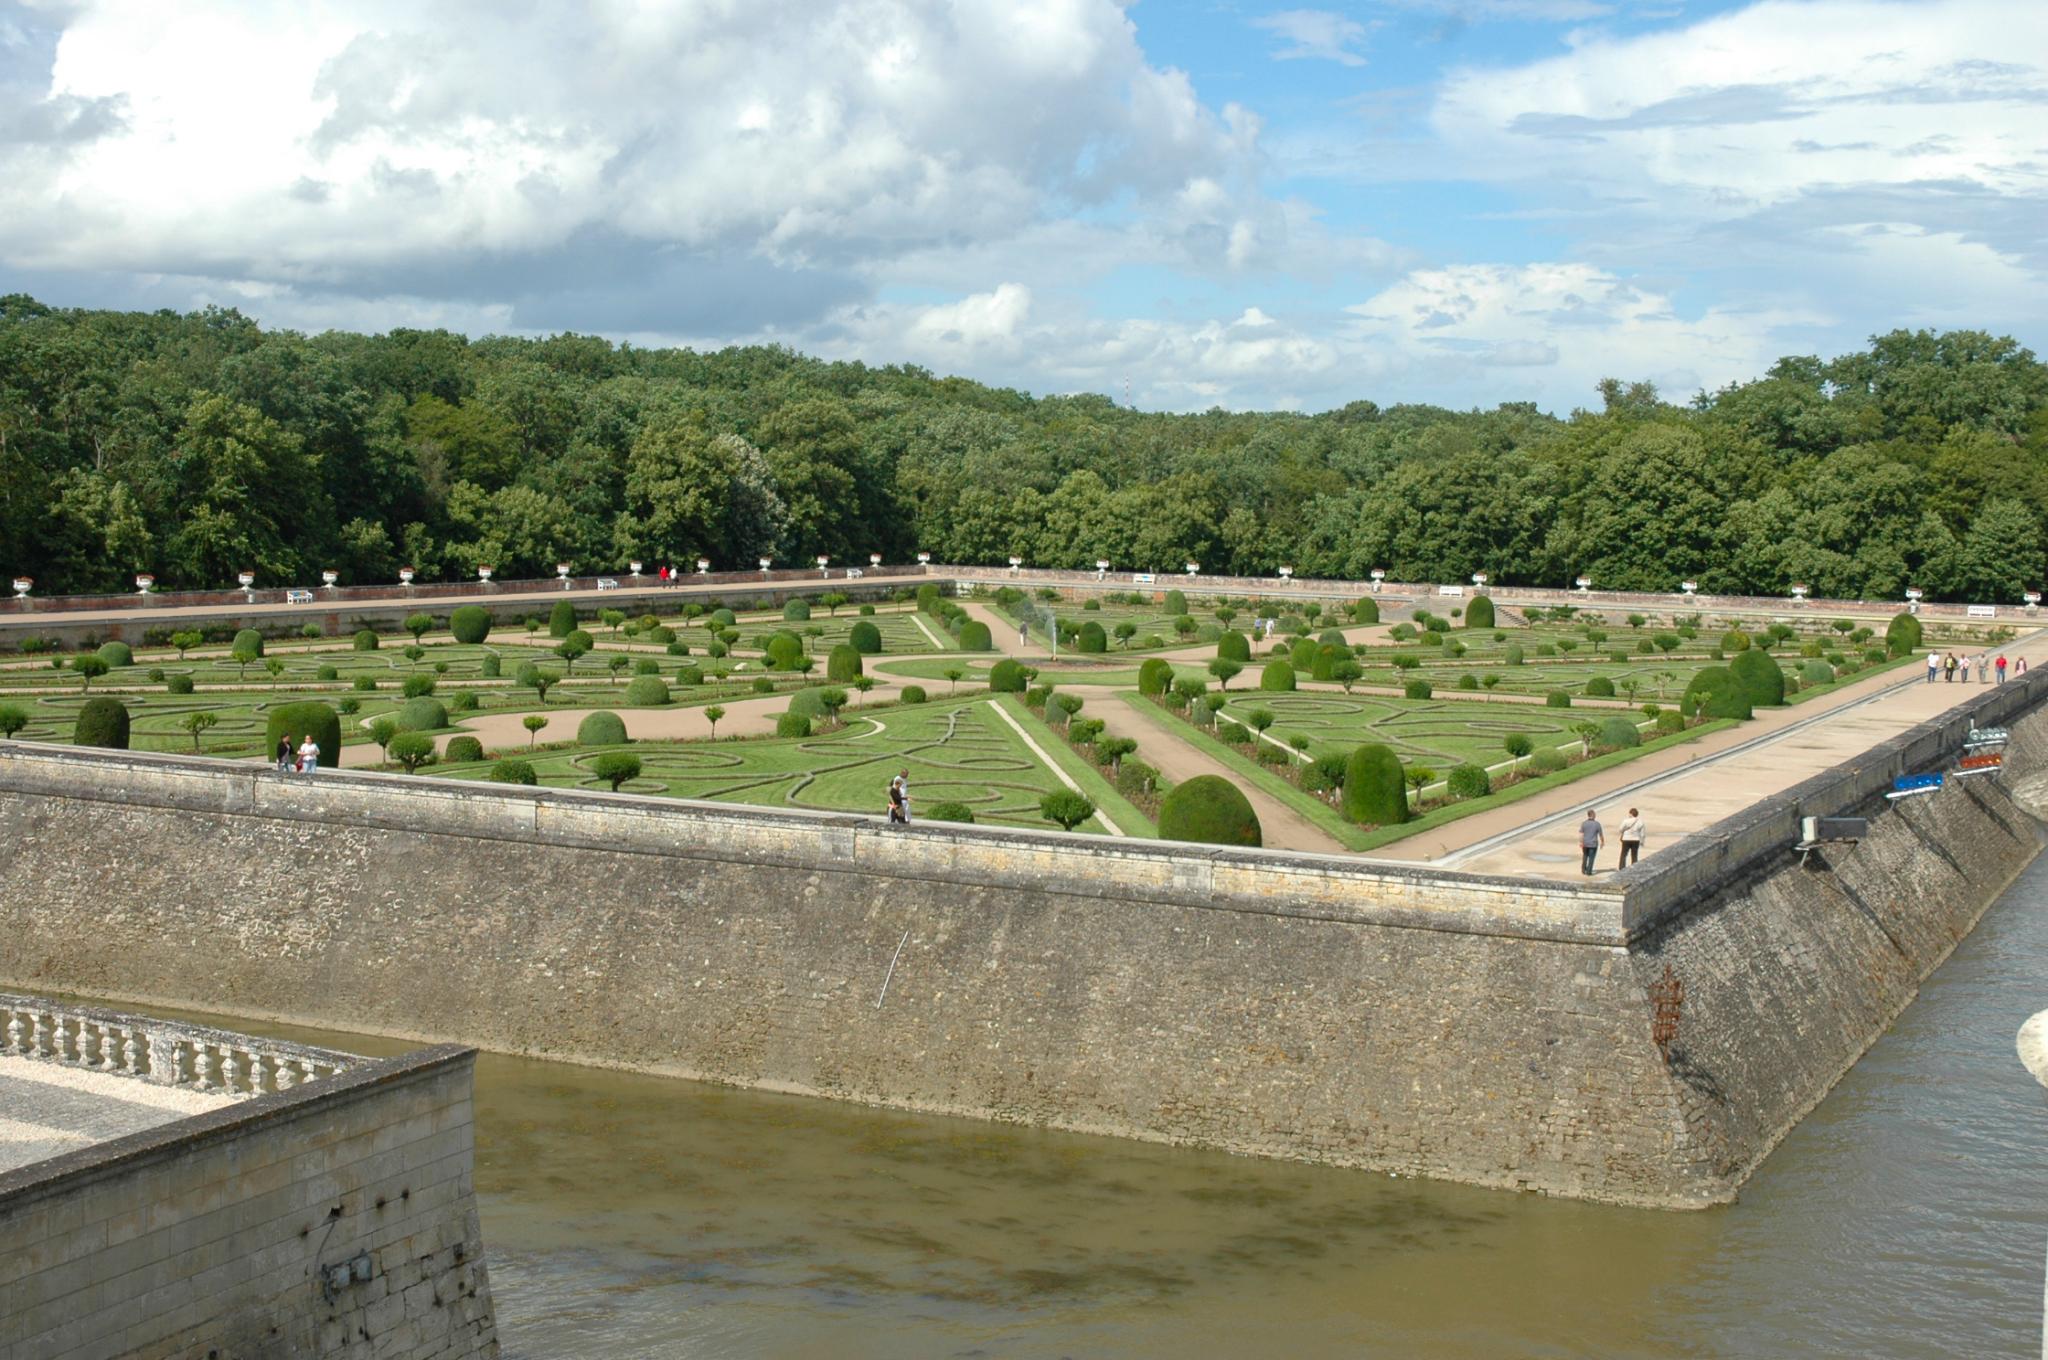 5 jardins ch teaux de la loire - Jardin de chen ...